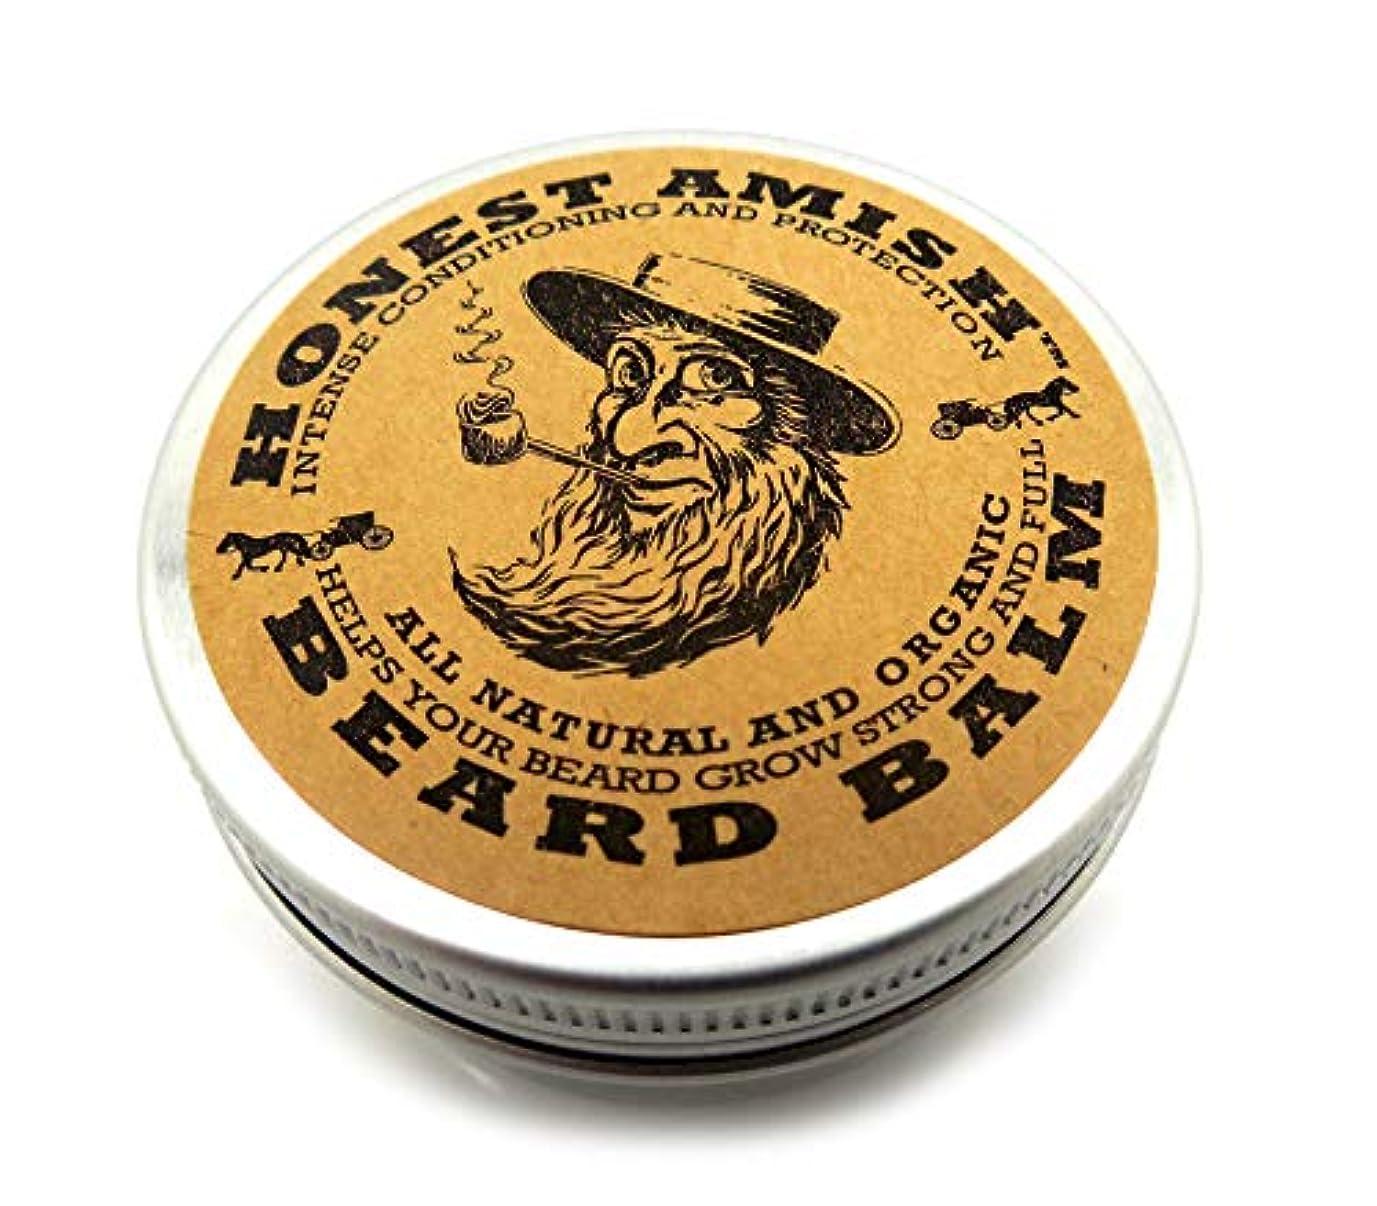 Honest Amish あごひげバームリーブインコンディショナーナチュラルオーガニックオイル、バター約 60ml 並行輸入品